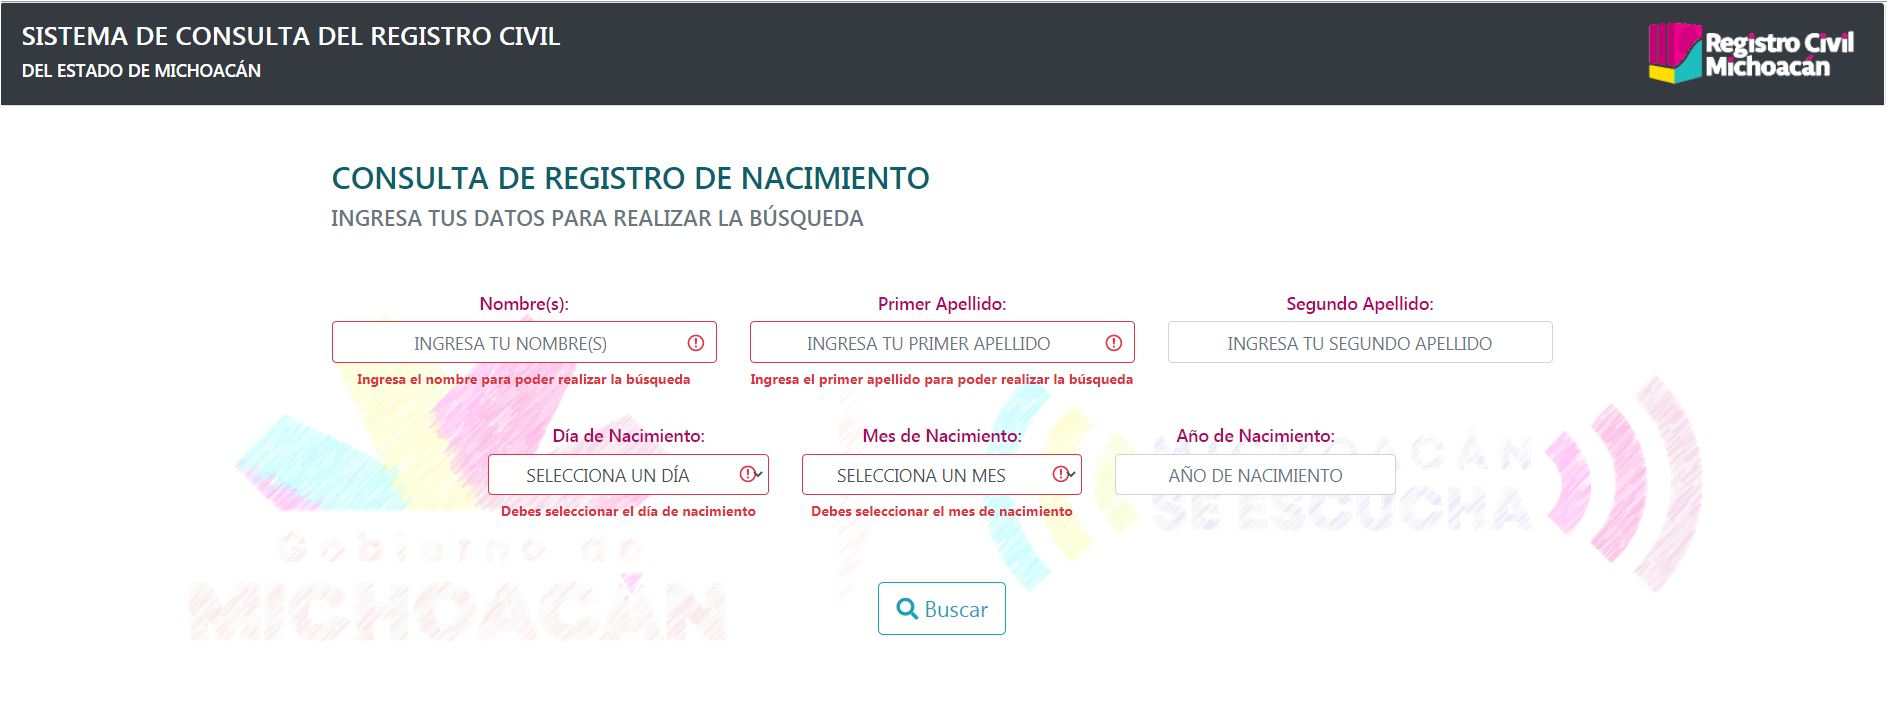 Consulta curp Registro Civil Michoacan